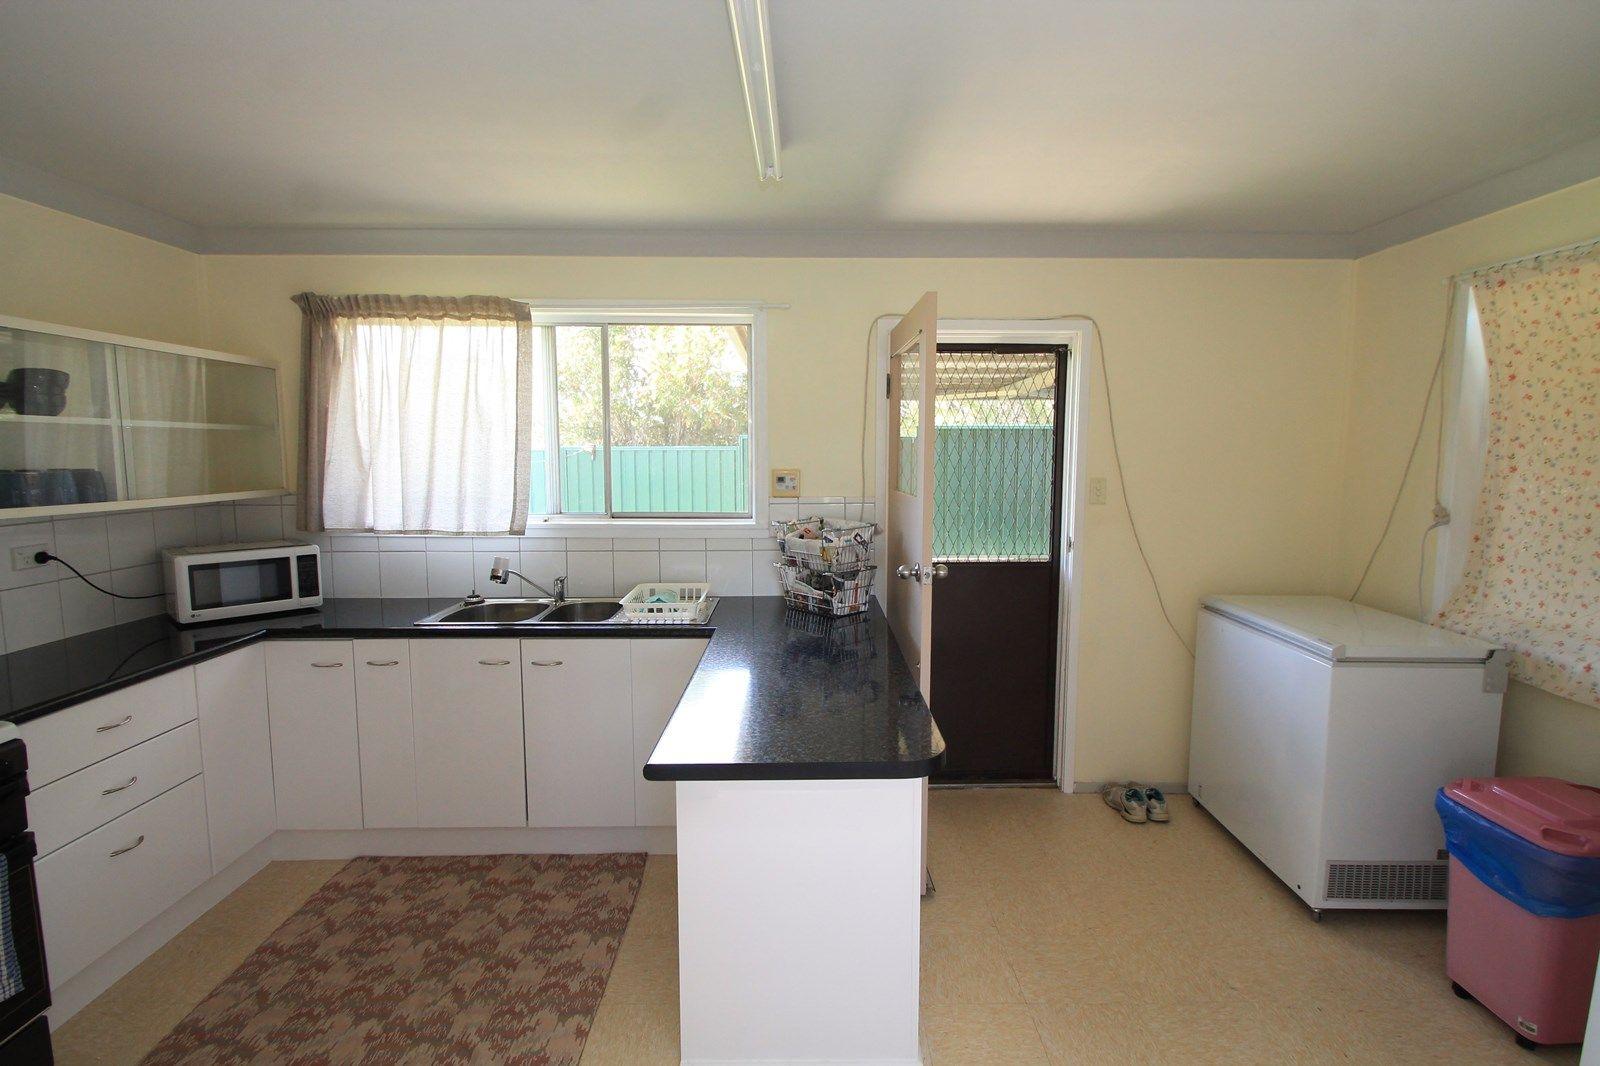 295-297 Wood St, Warwick QLD 4370, Image 2